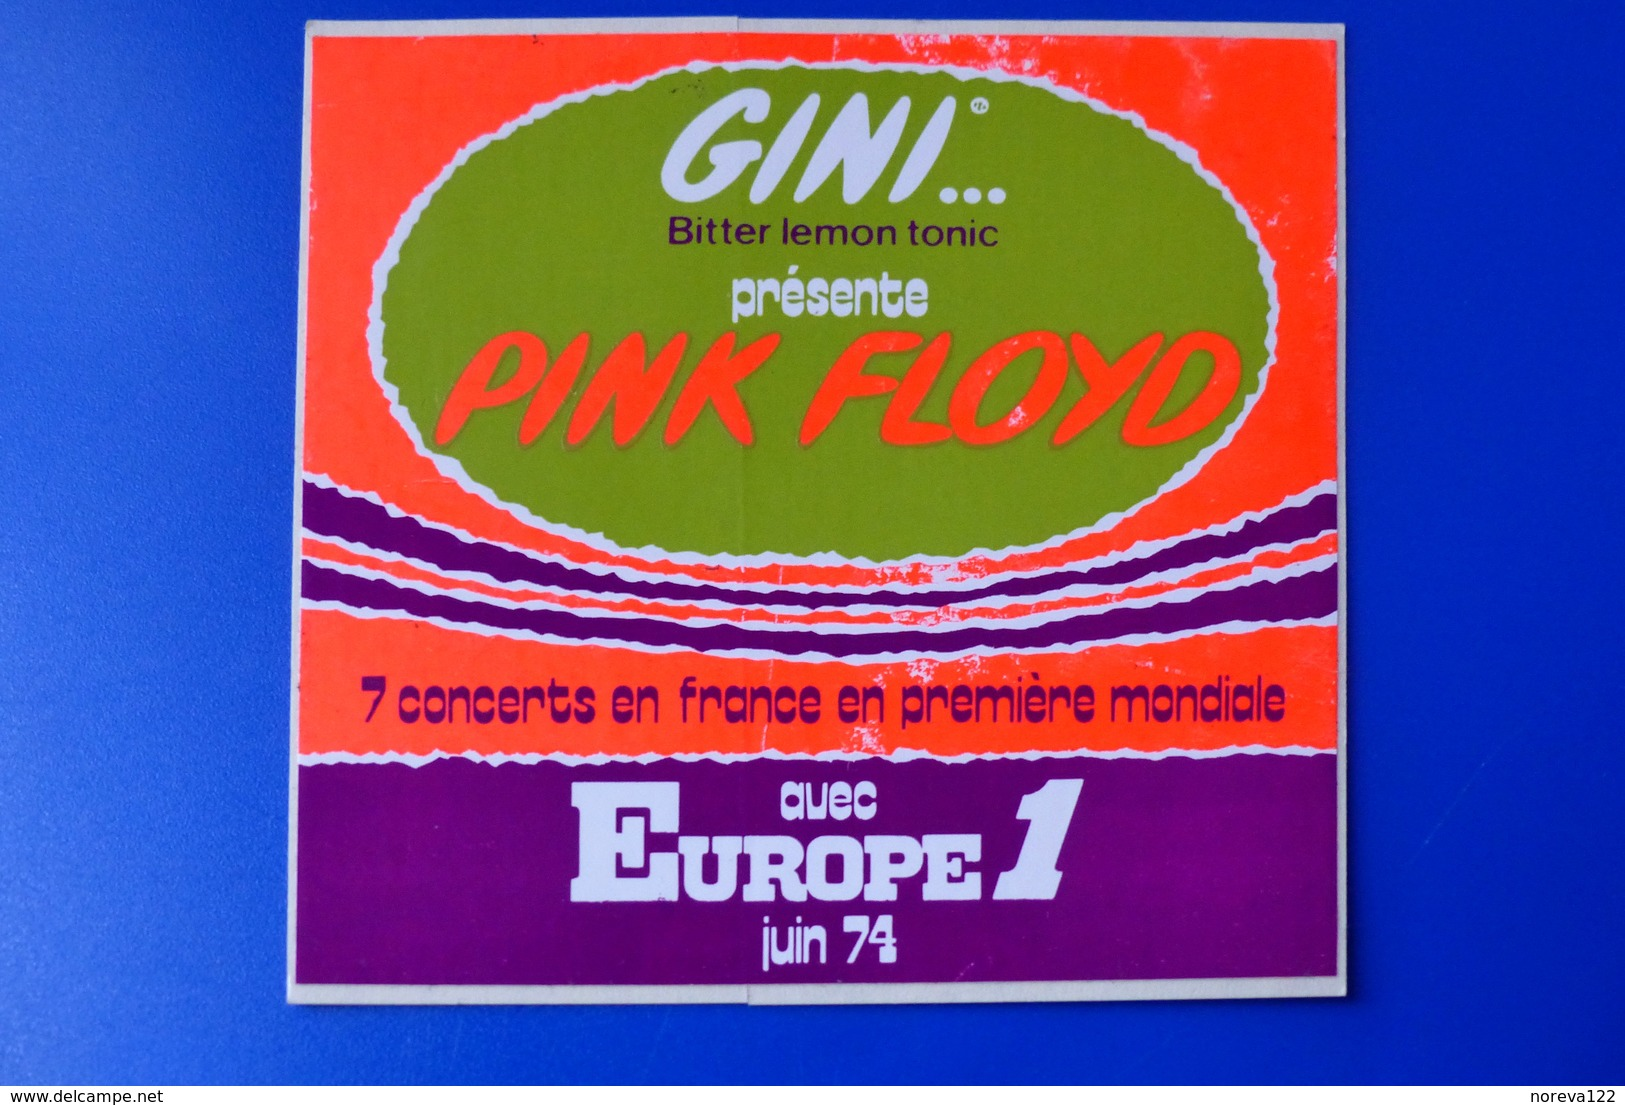 A.C.  1974 Gini Présente PINK FLOYD Avec Europe1 - Stickers